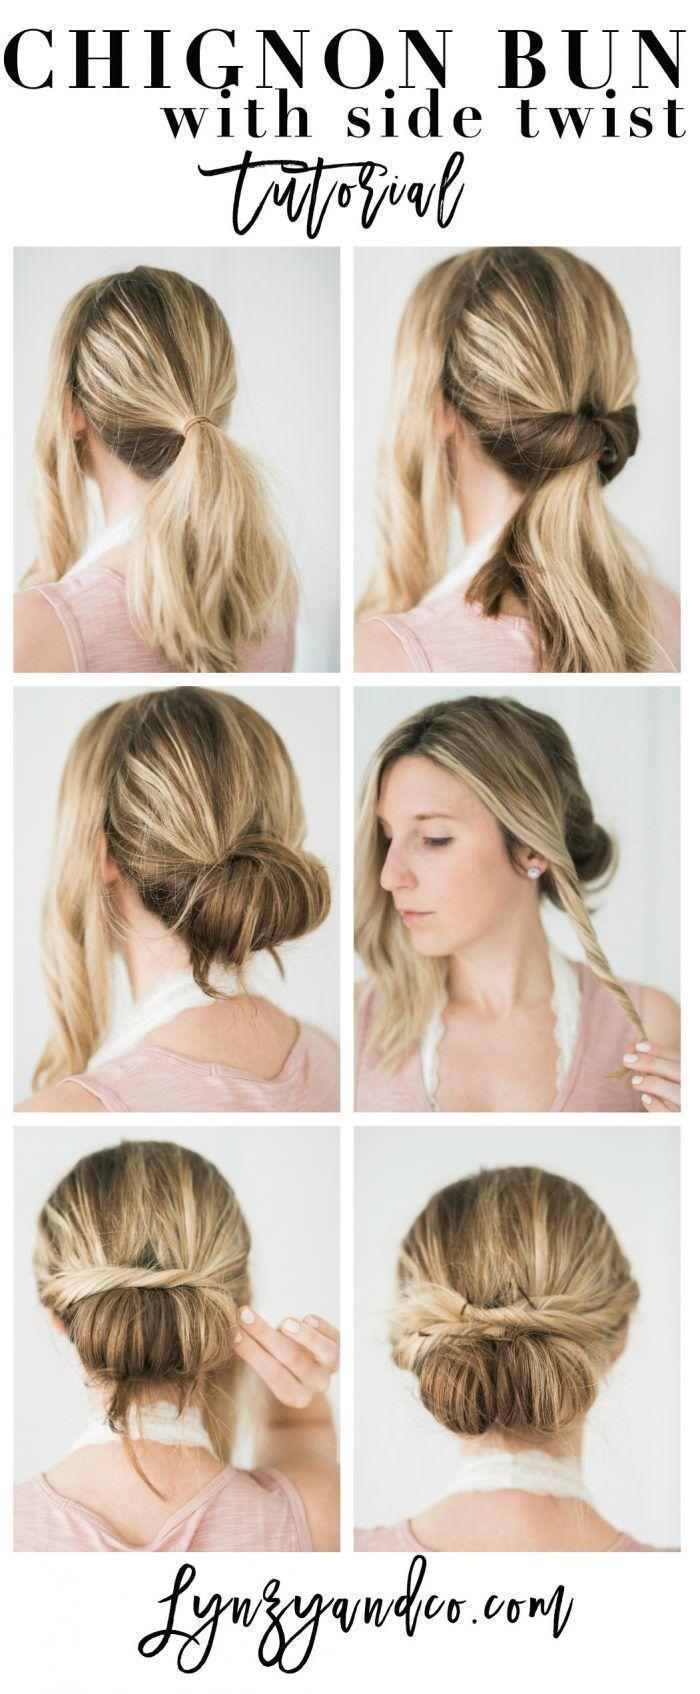 Simple Hair Tutorial // Chignon Bun with Twist - Lynzy & Co